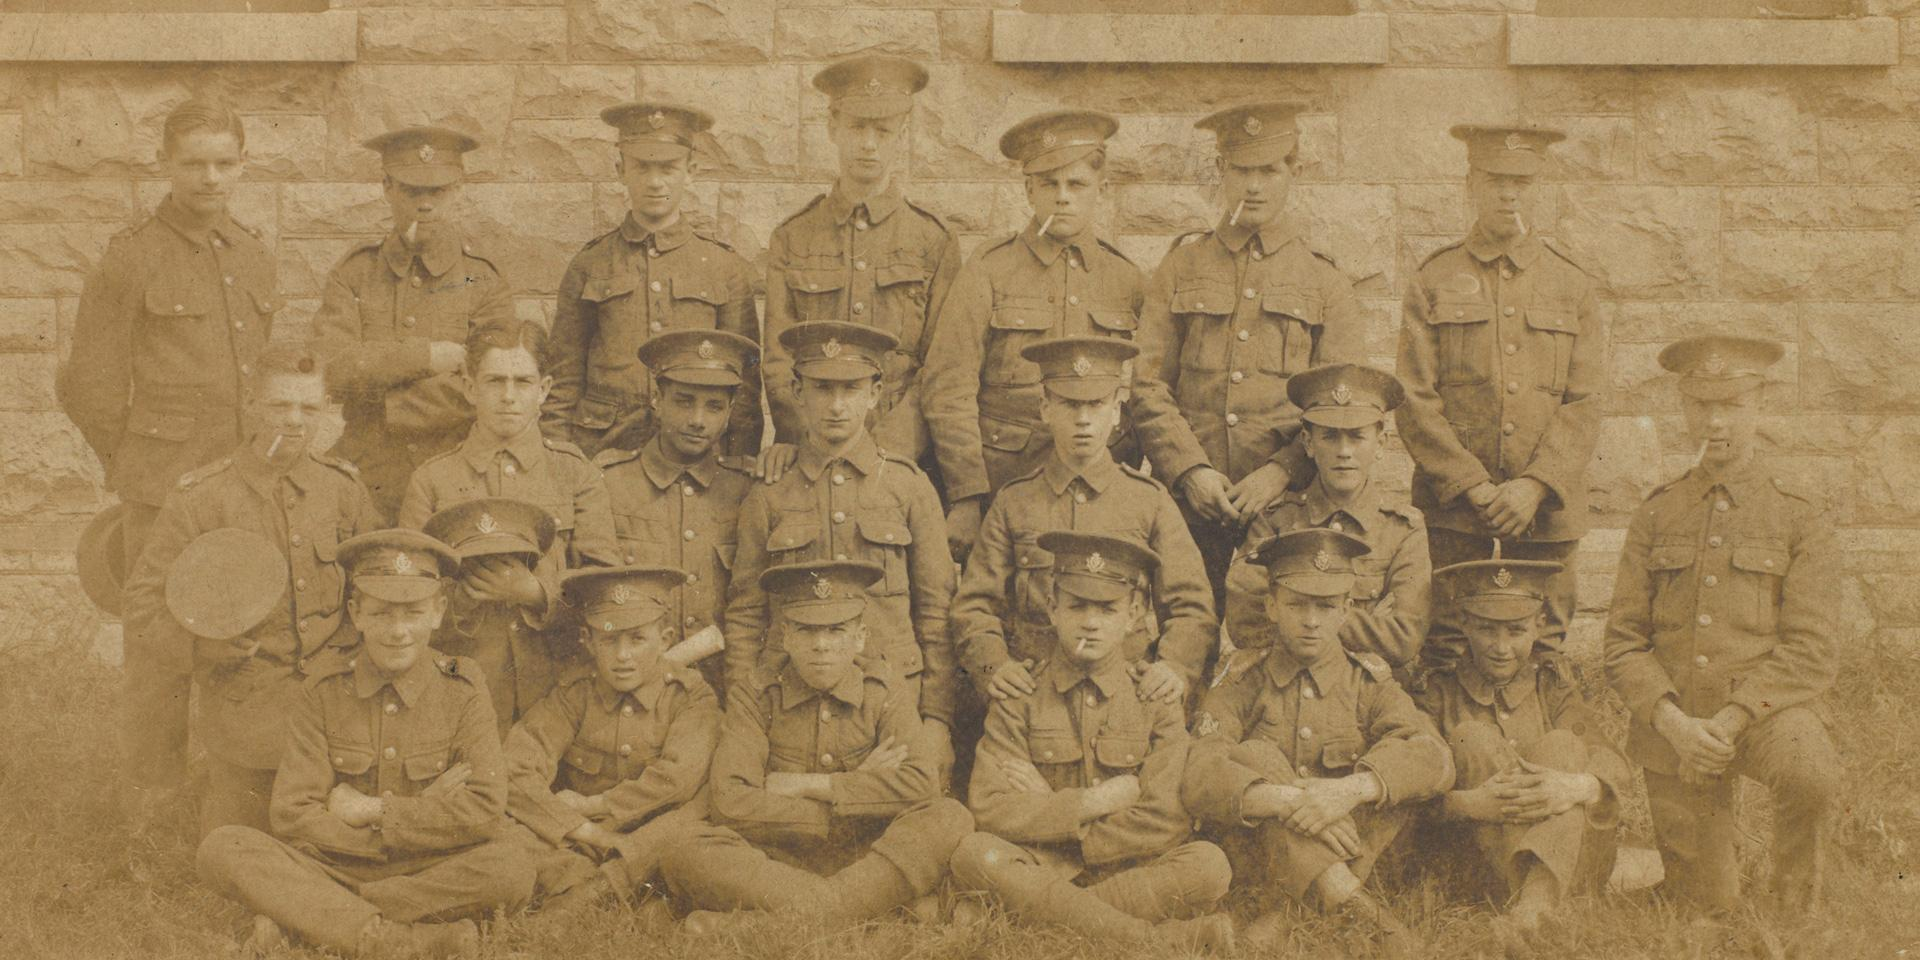 Bandsmen of the 1st Bn Connaught Rangers, Ireland, 1917